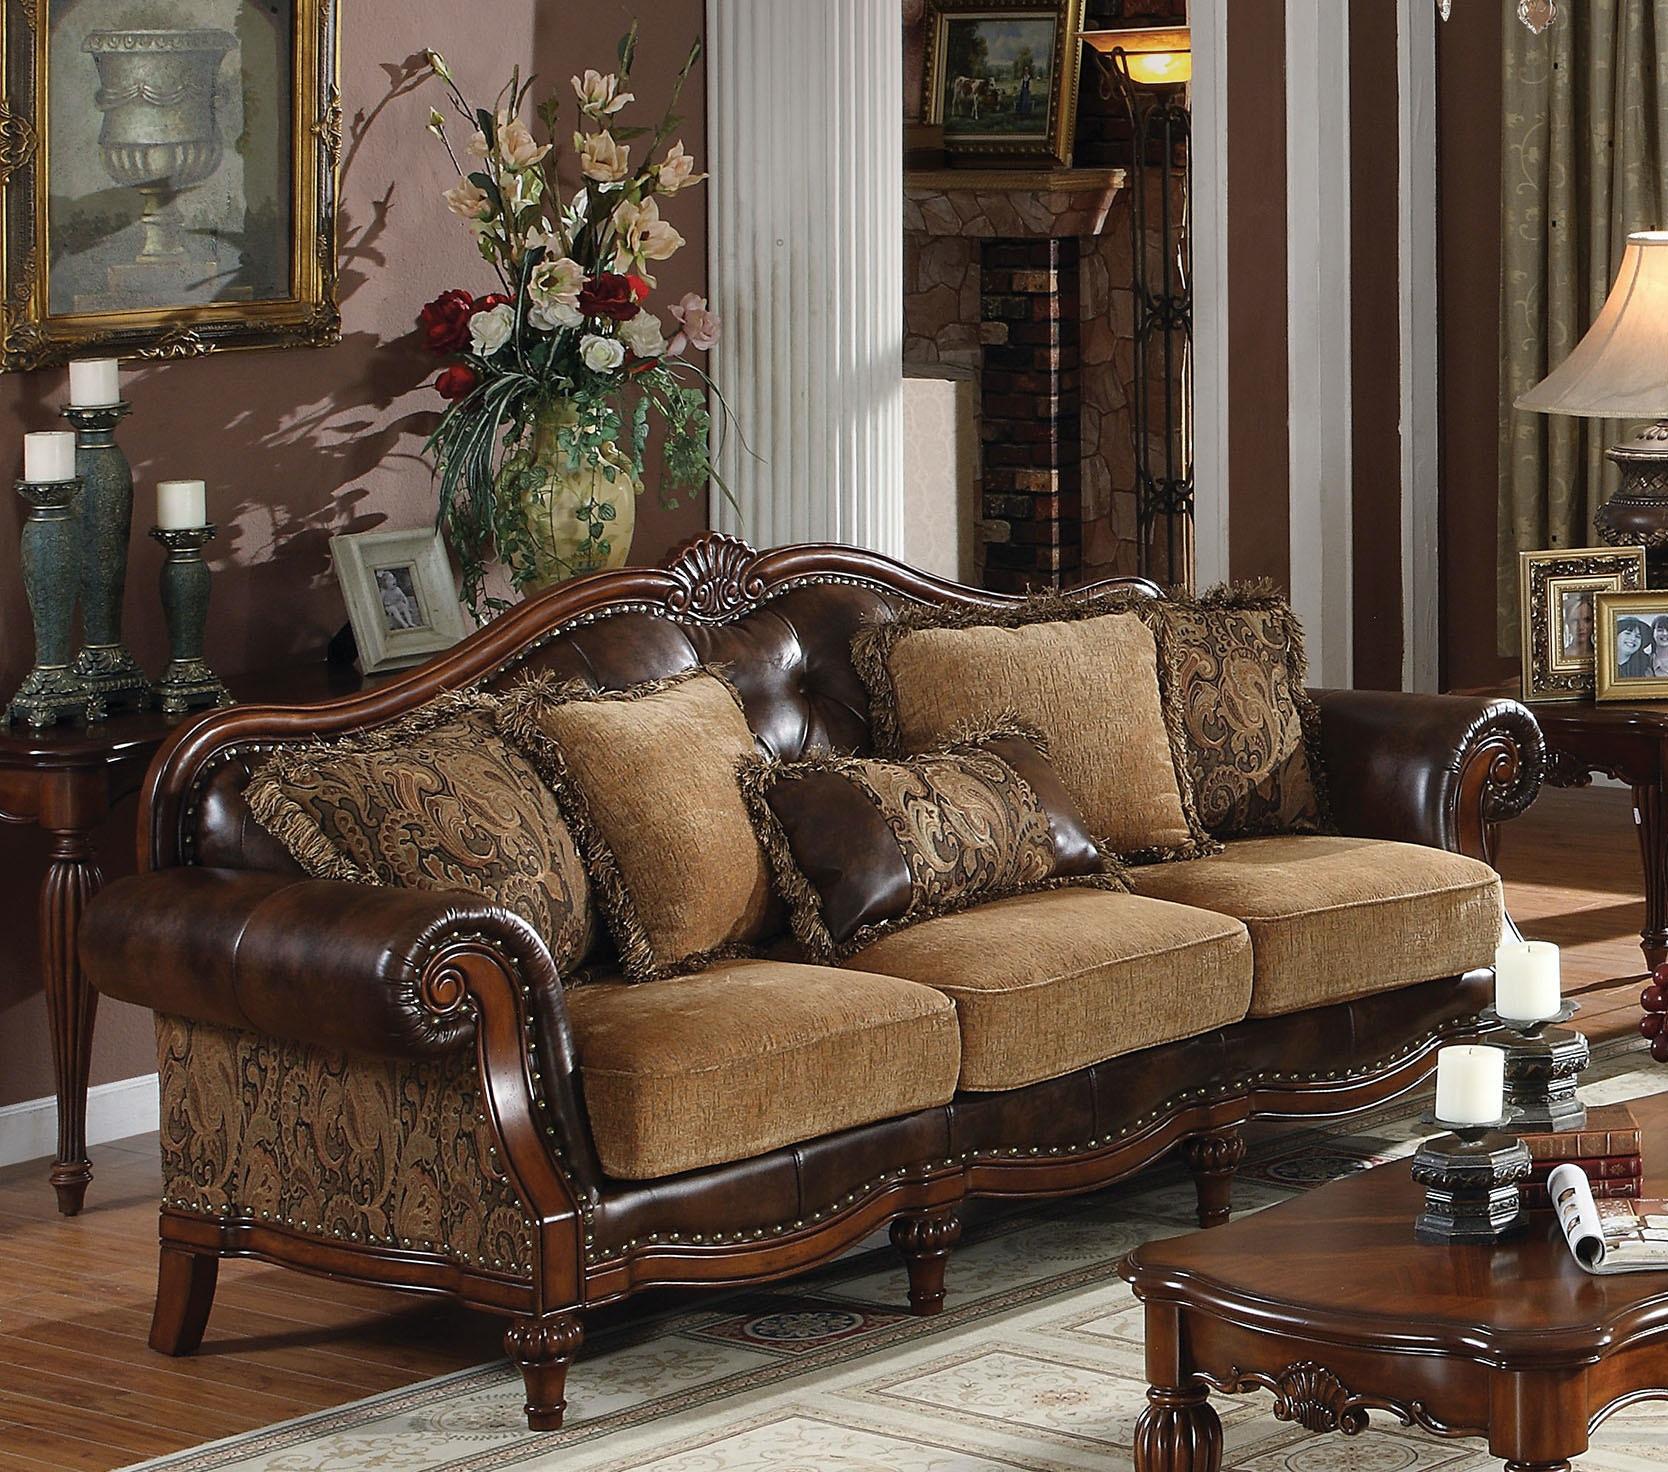 Ordinaire Acme Furniture Dreena Sofa 05495